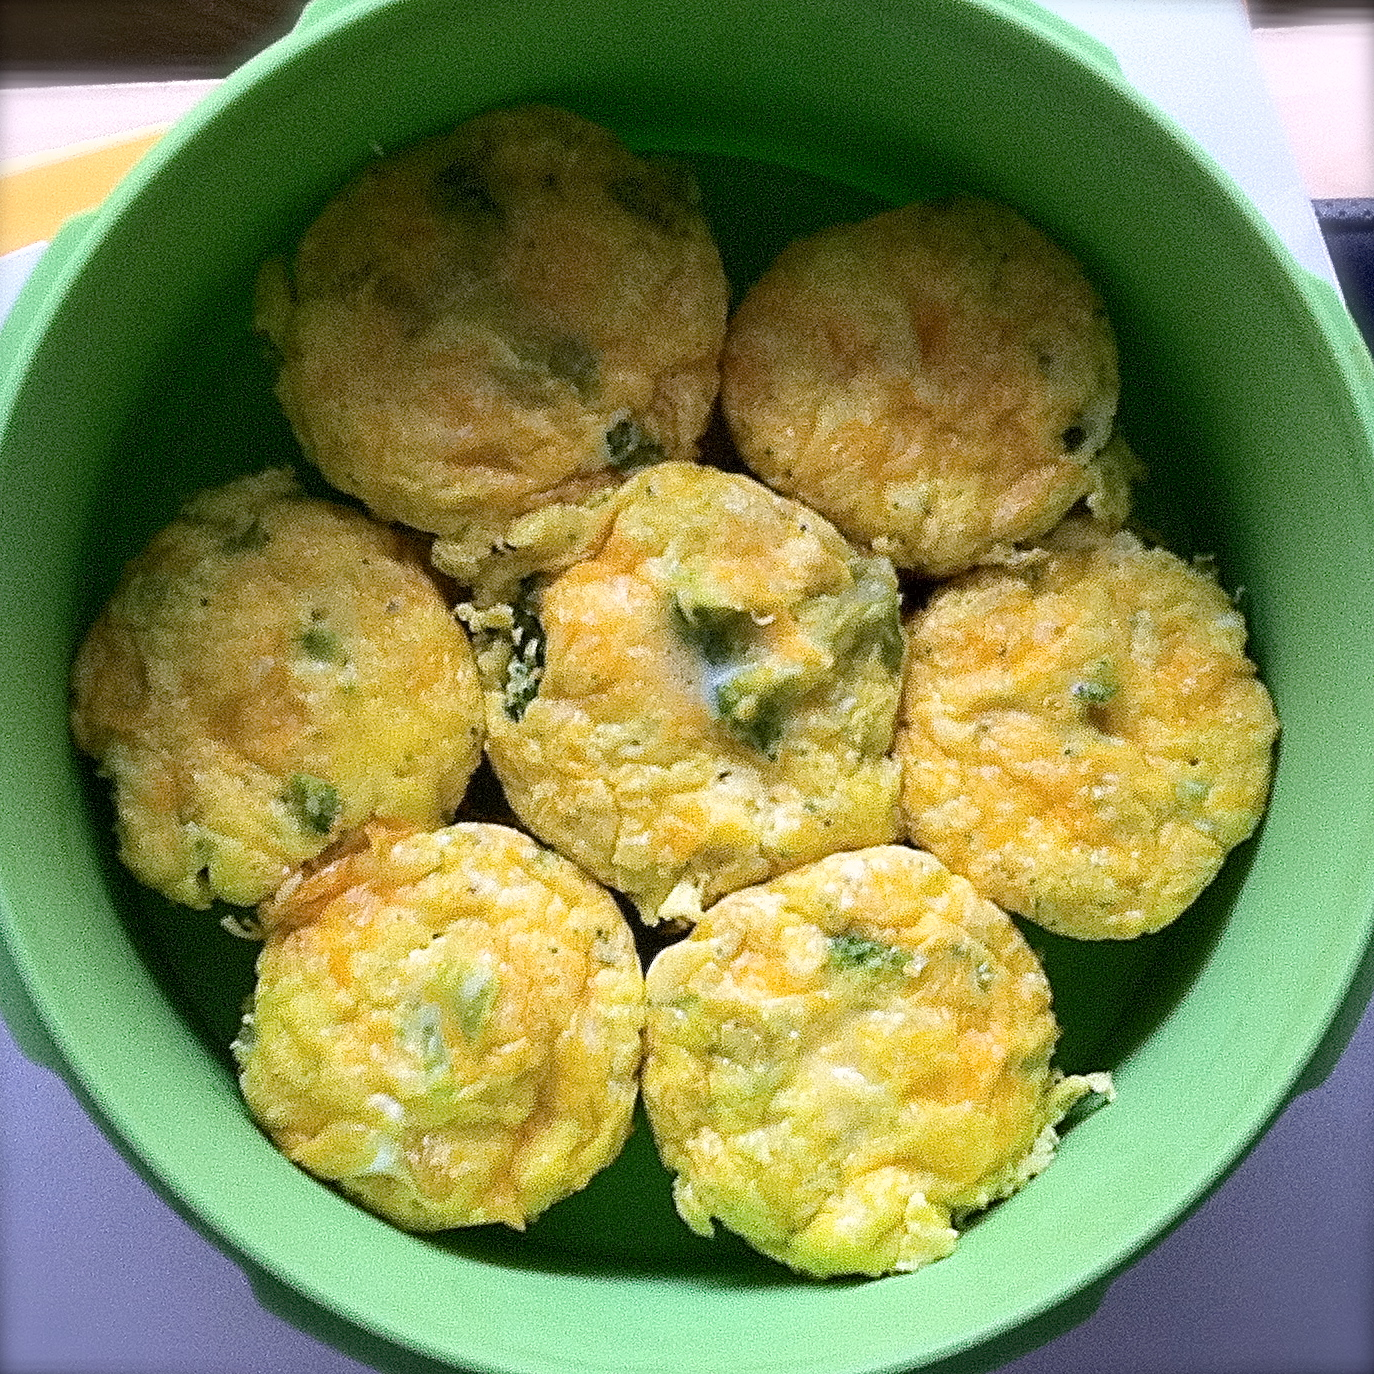 ... broccoli and cheese mini egg egg broccoli and cheese mini egg omelets